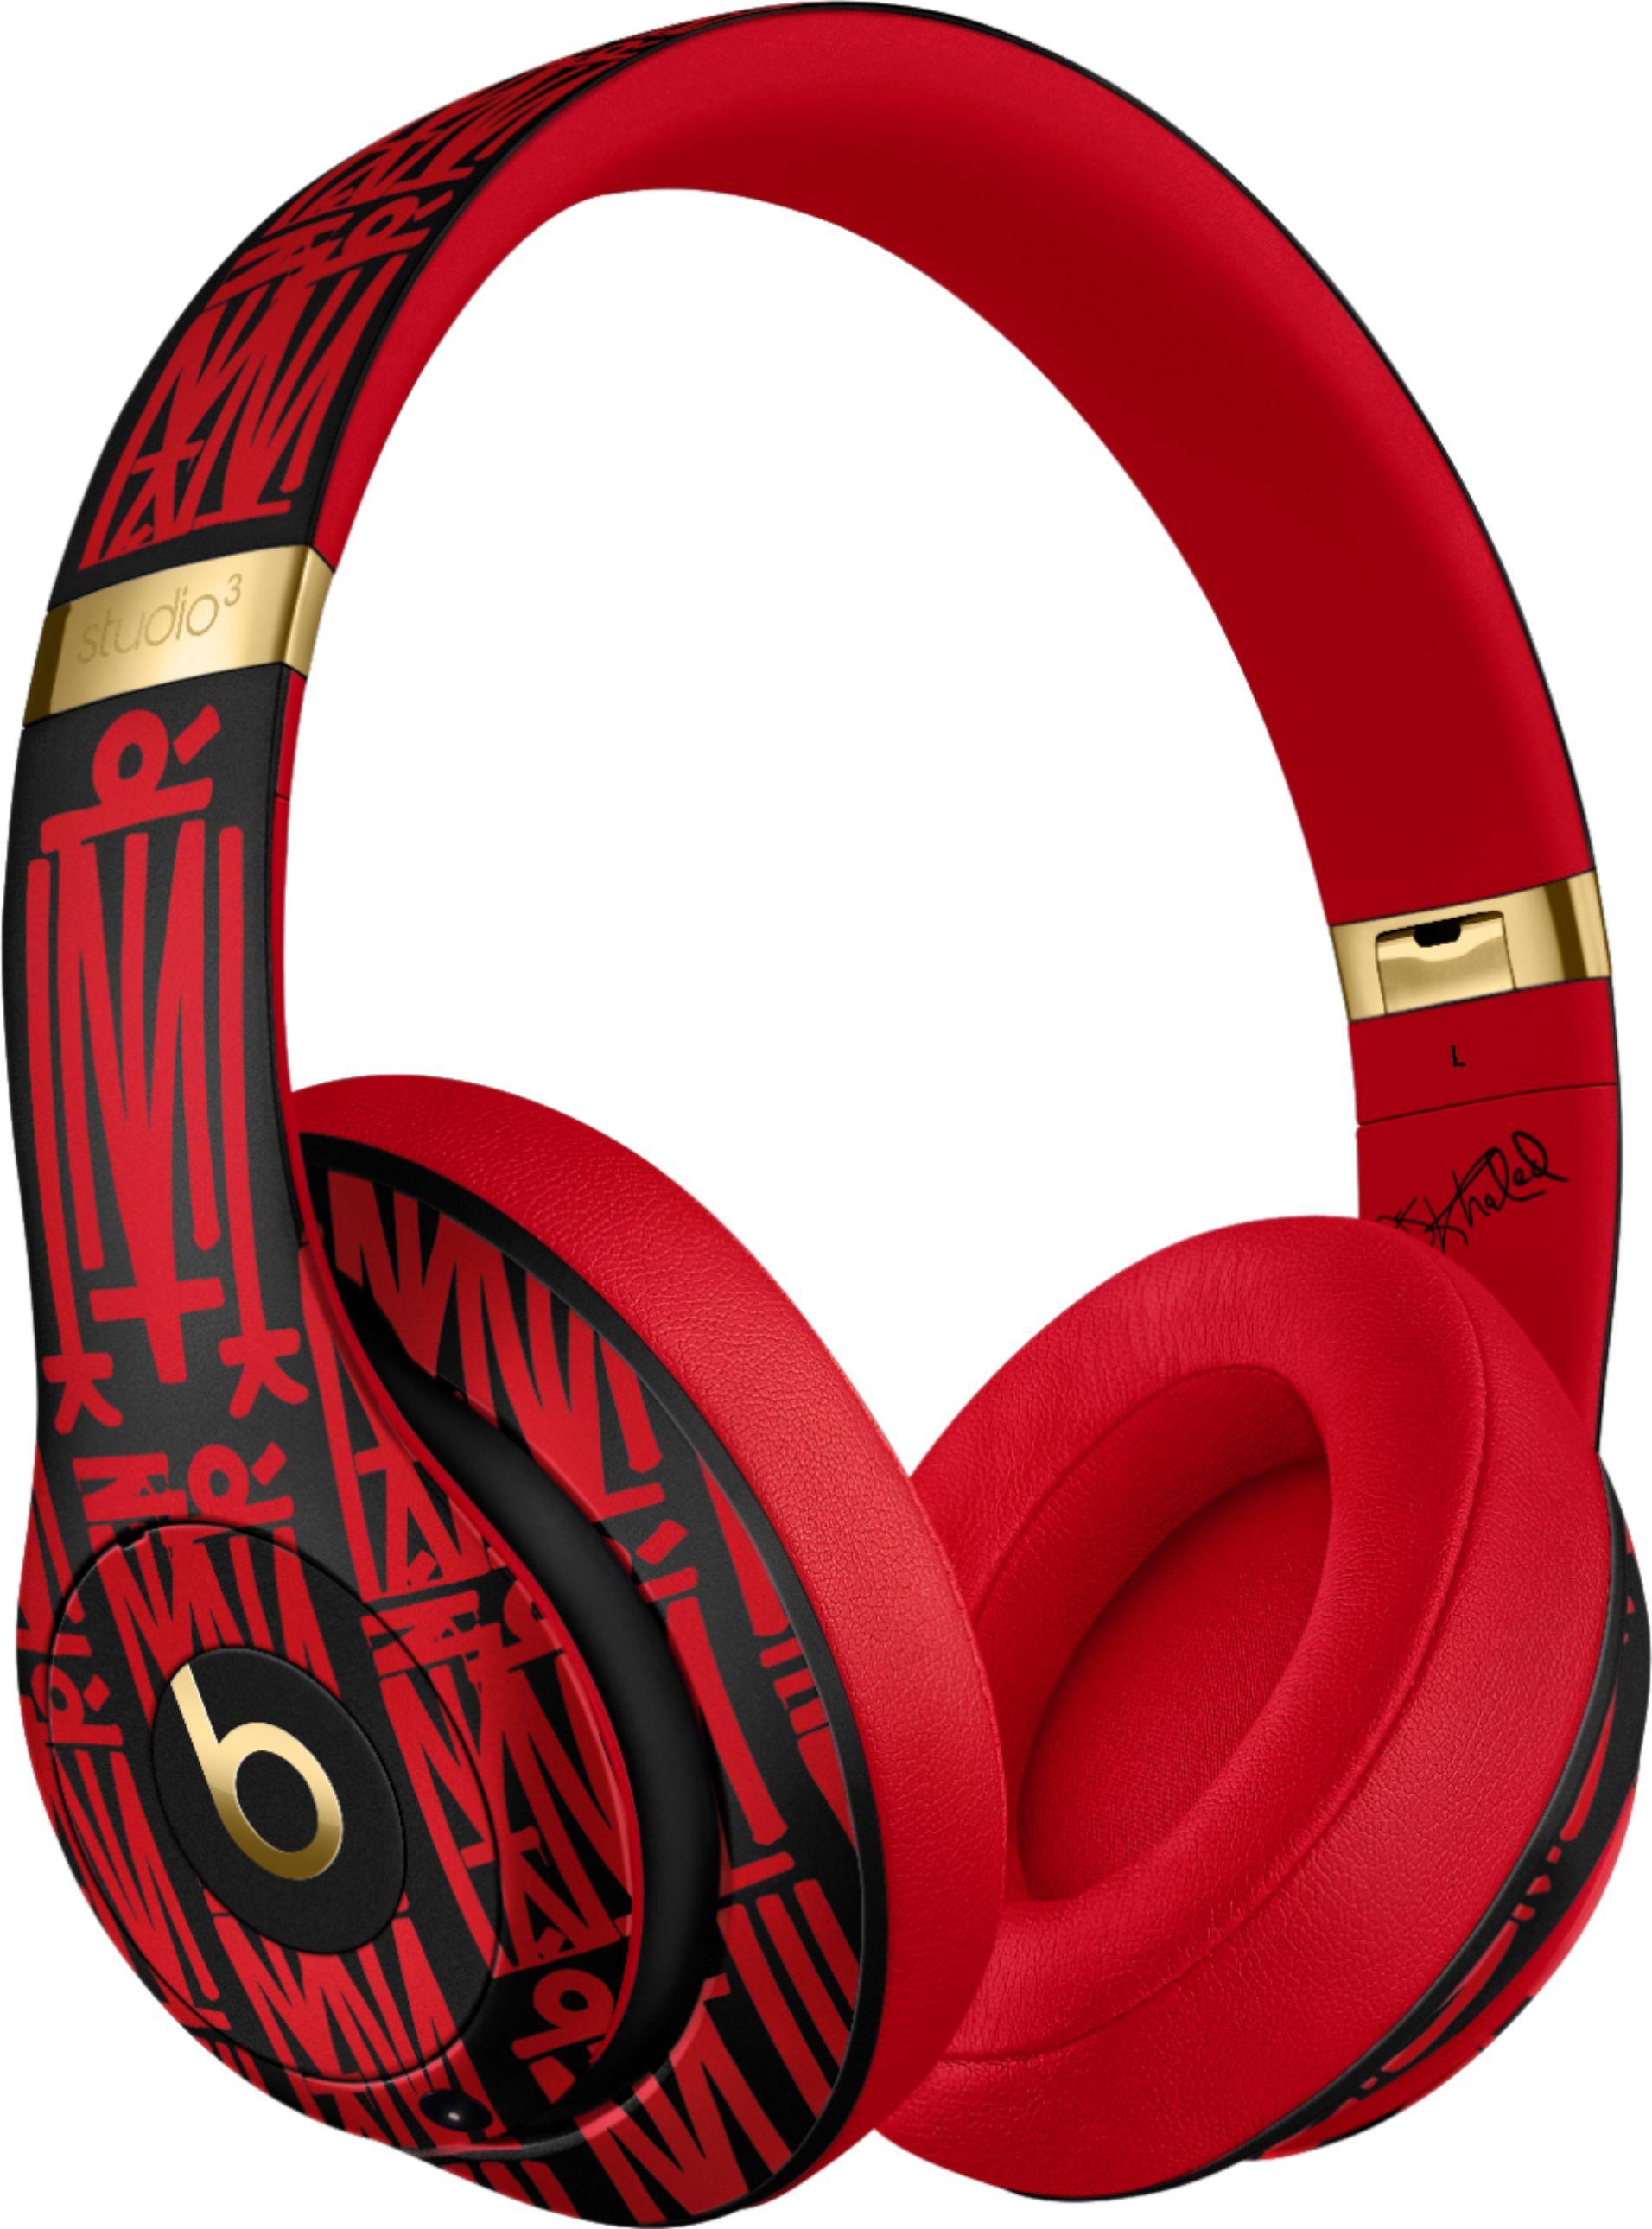 Beats By Dre Studio 3 DJ Khaled Custom Edition Wireless Headphones £149.99 @ Foot Locker